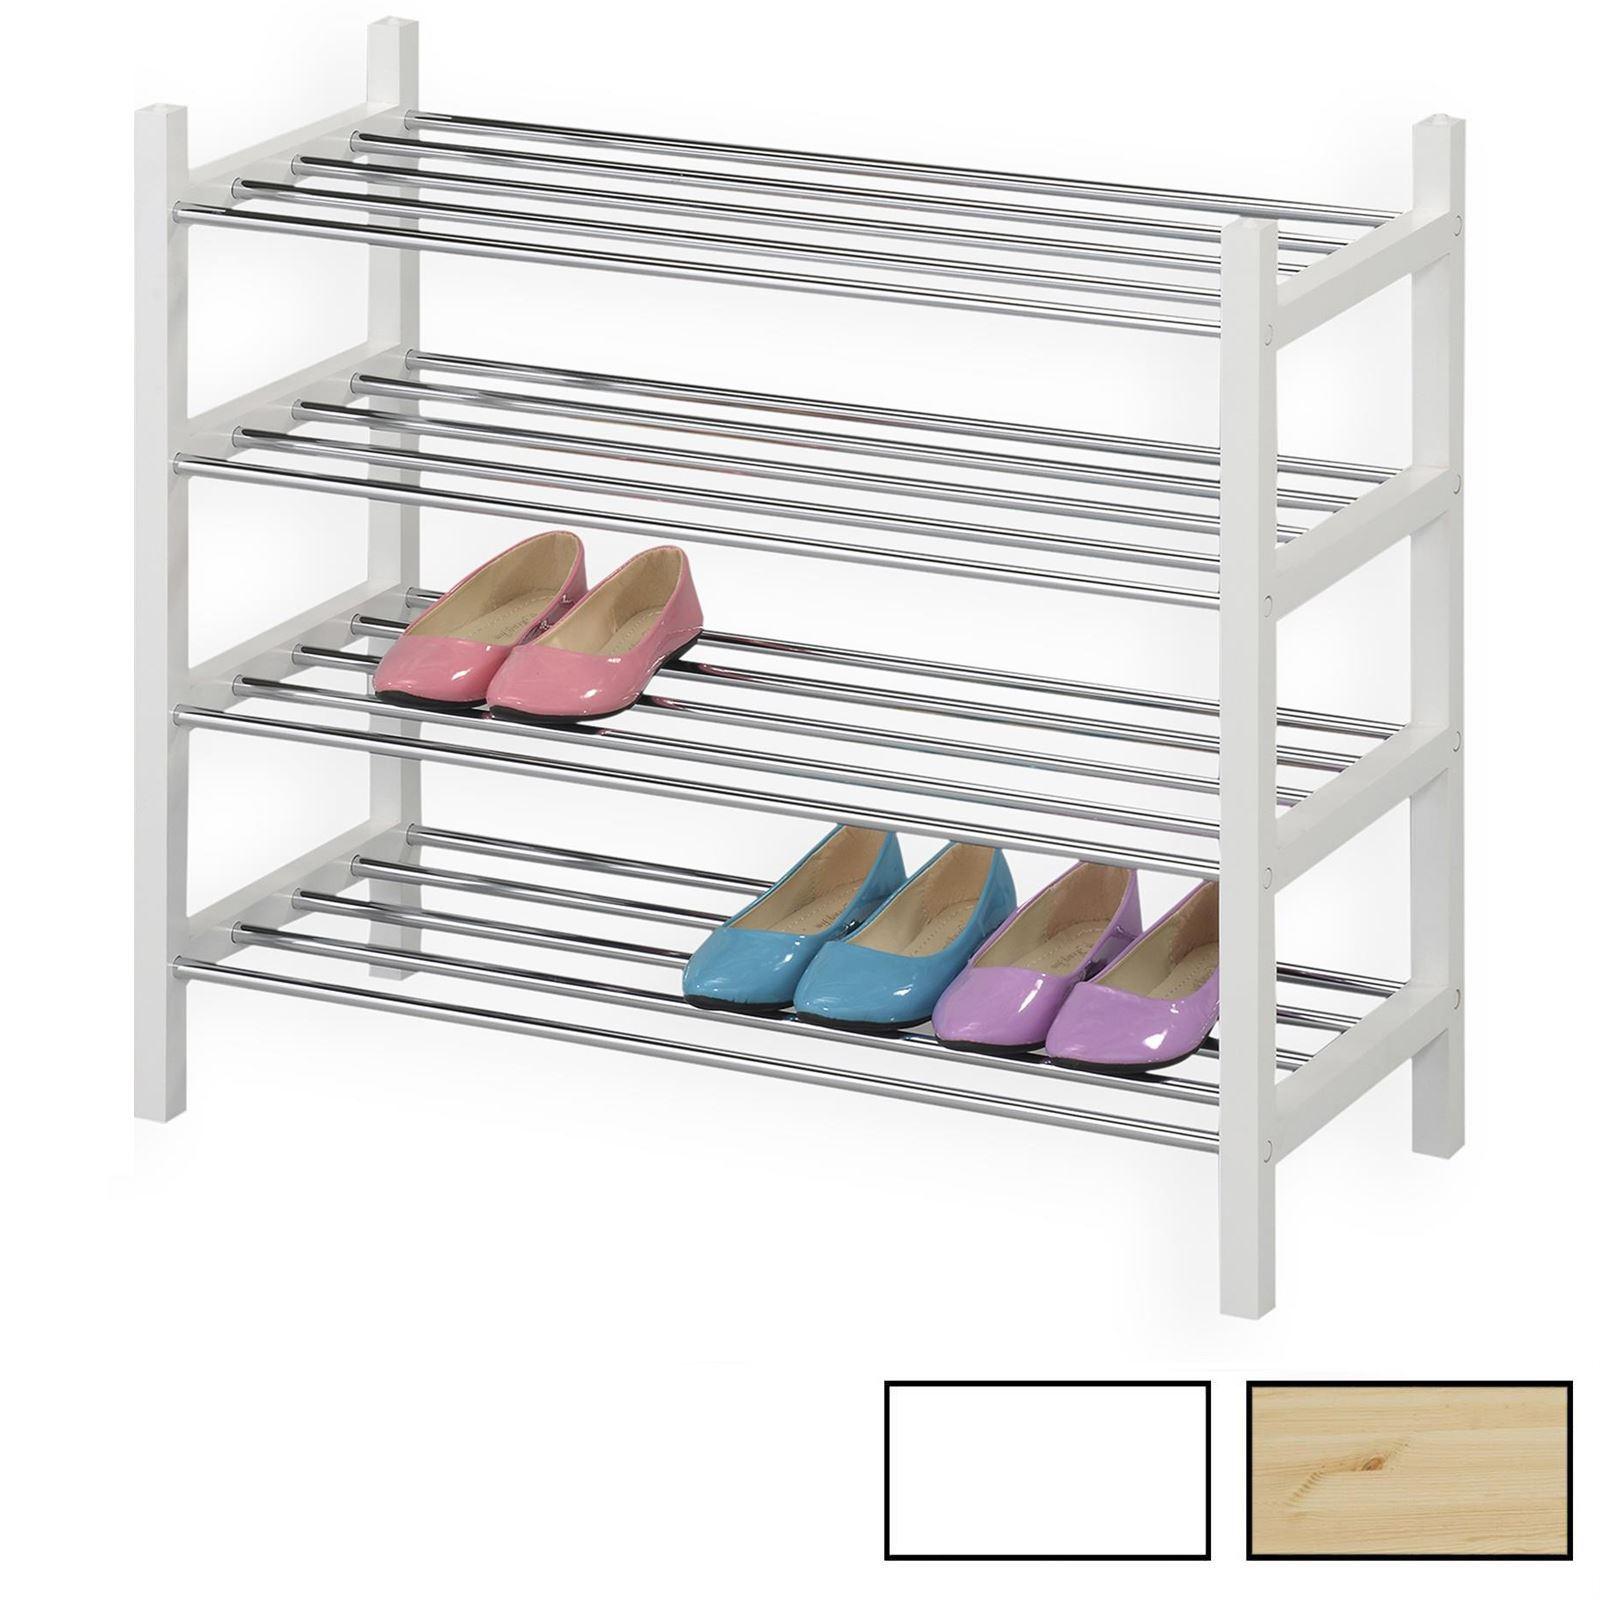 schuhregal resa mit 4 b den in 4 farben mobilia24. Black Bedroom Furniture Sets. Home Design Ideas